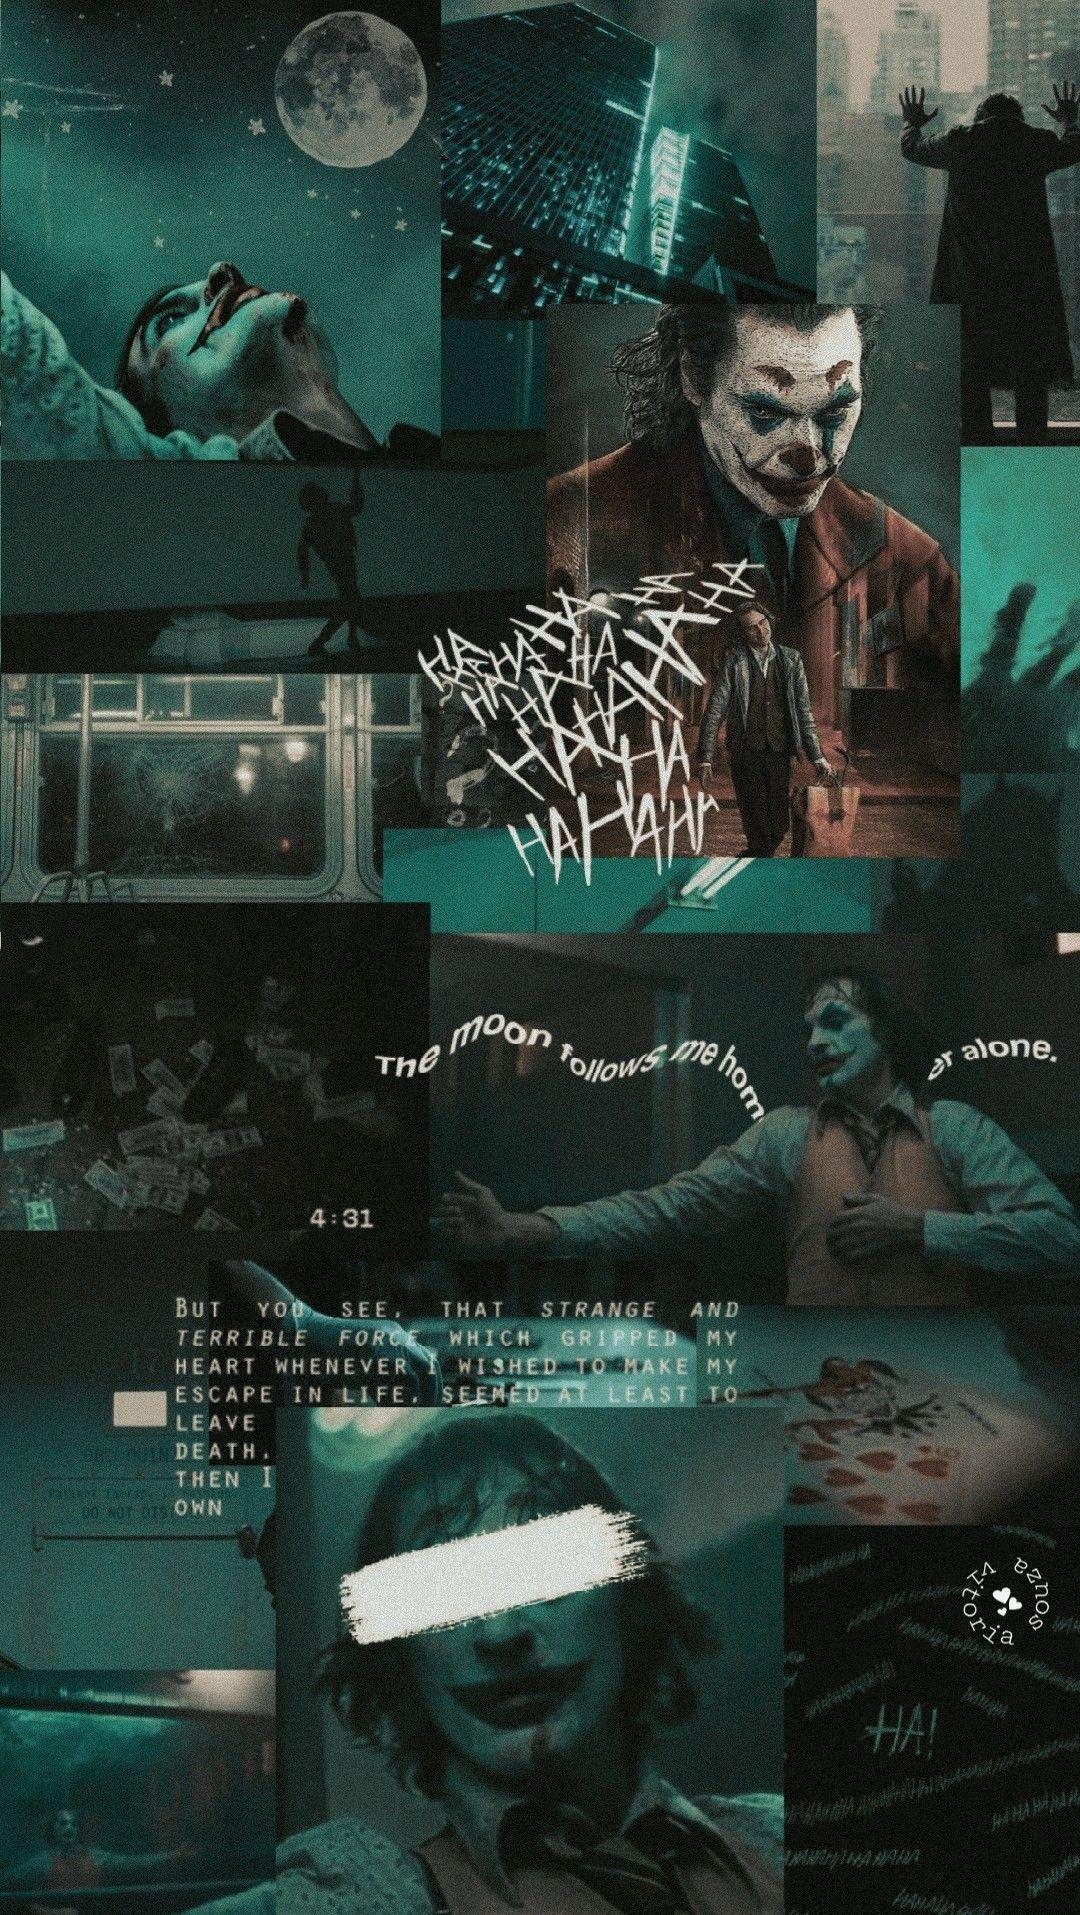 Joker Aesthetic Wallpapers Wallpaper Cave